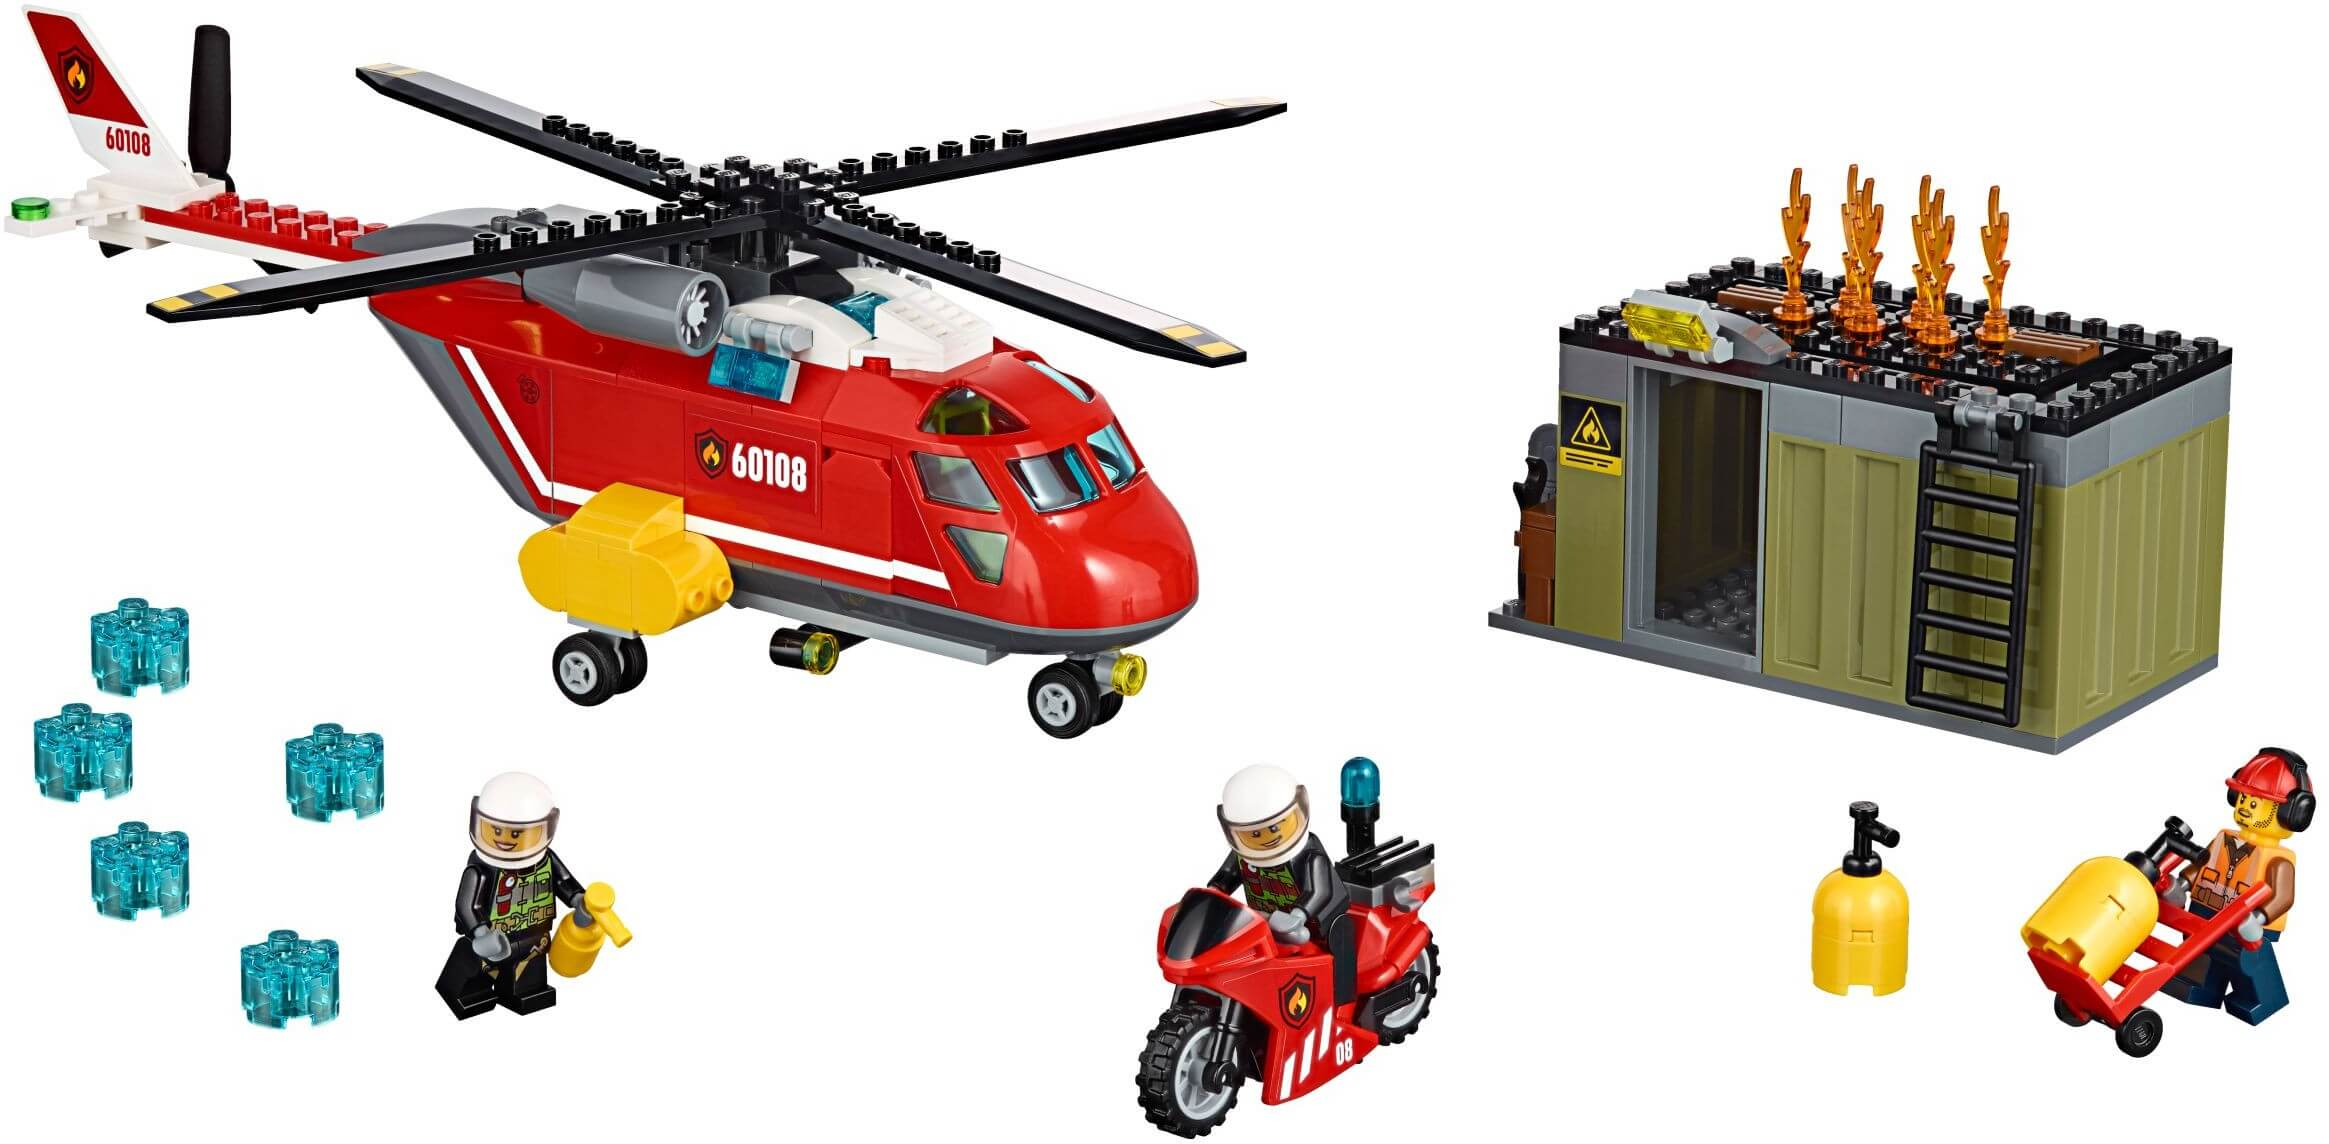 Mua đồ chơi LEGO 60108 - LEGO City 60108 - Trực Thăng Cứu Hỏa (LEGO City Fire Response Unit 60108)